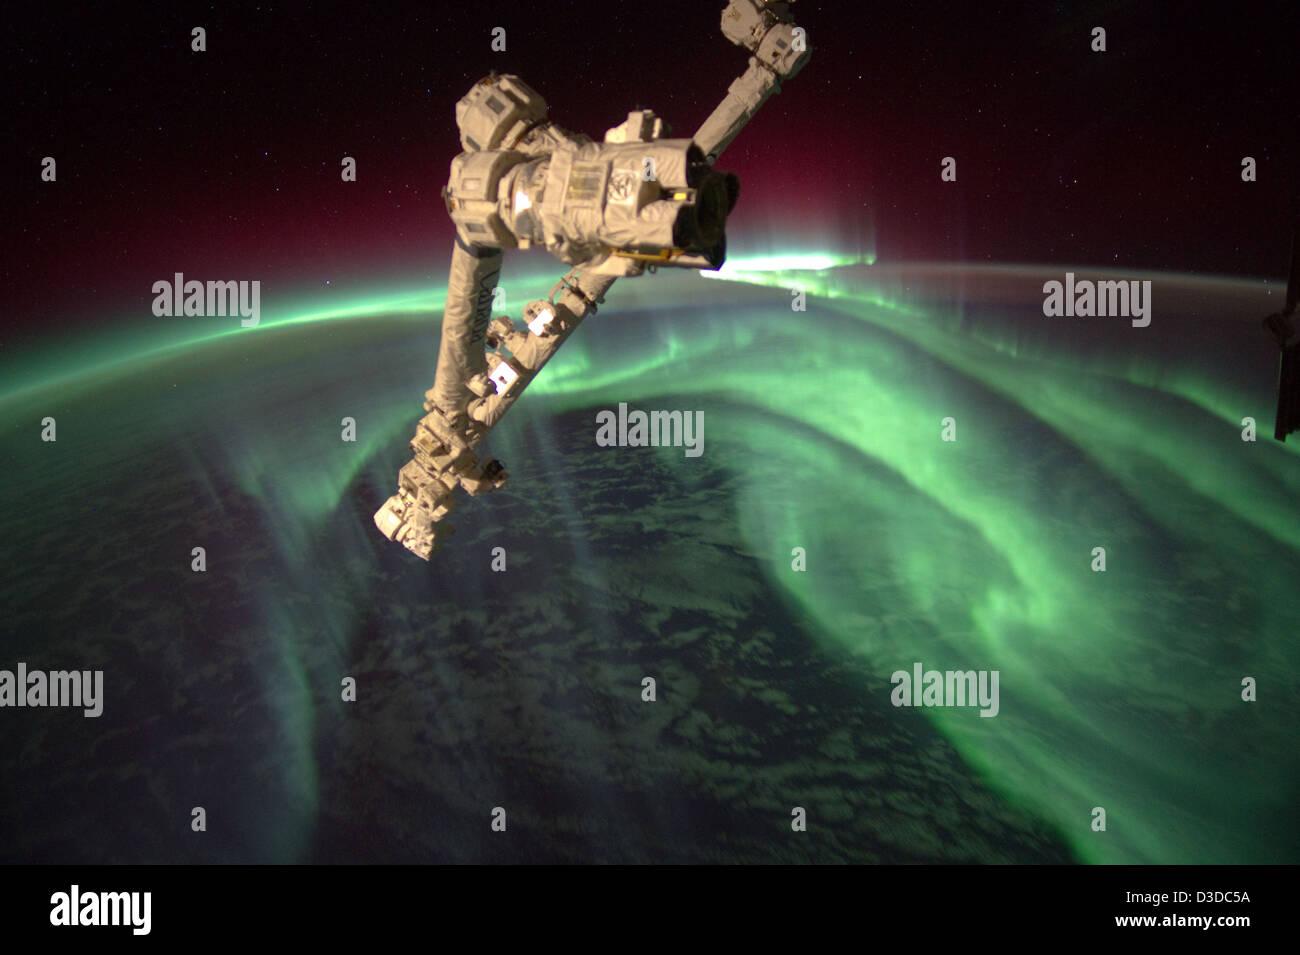 Aurora Australis (NASA, International Space Station, 07/15/12) - Stock Image